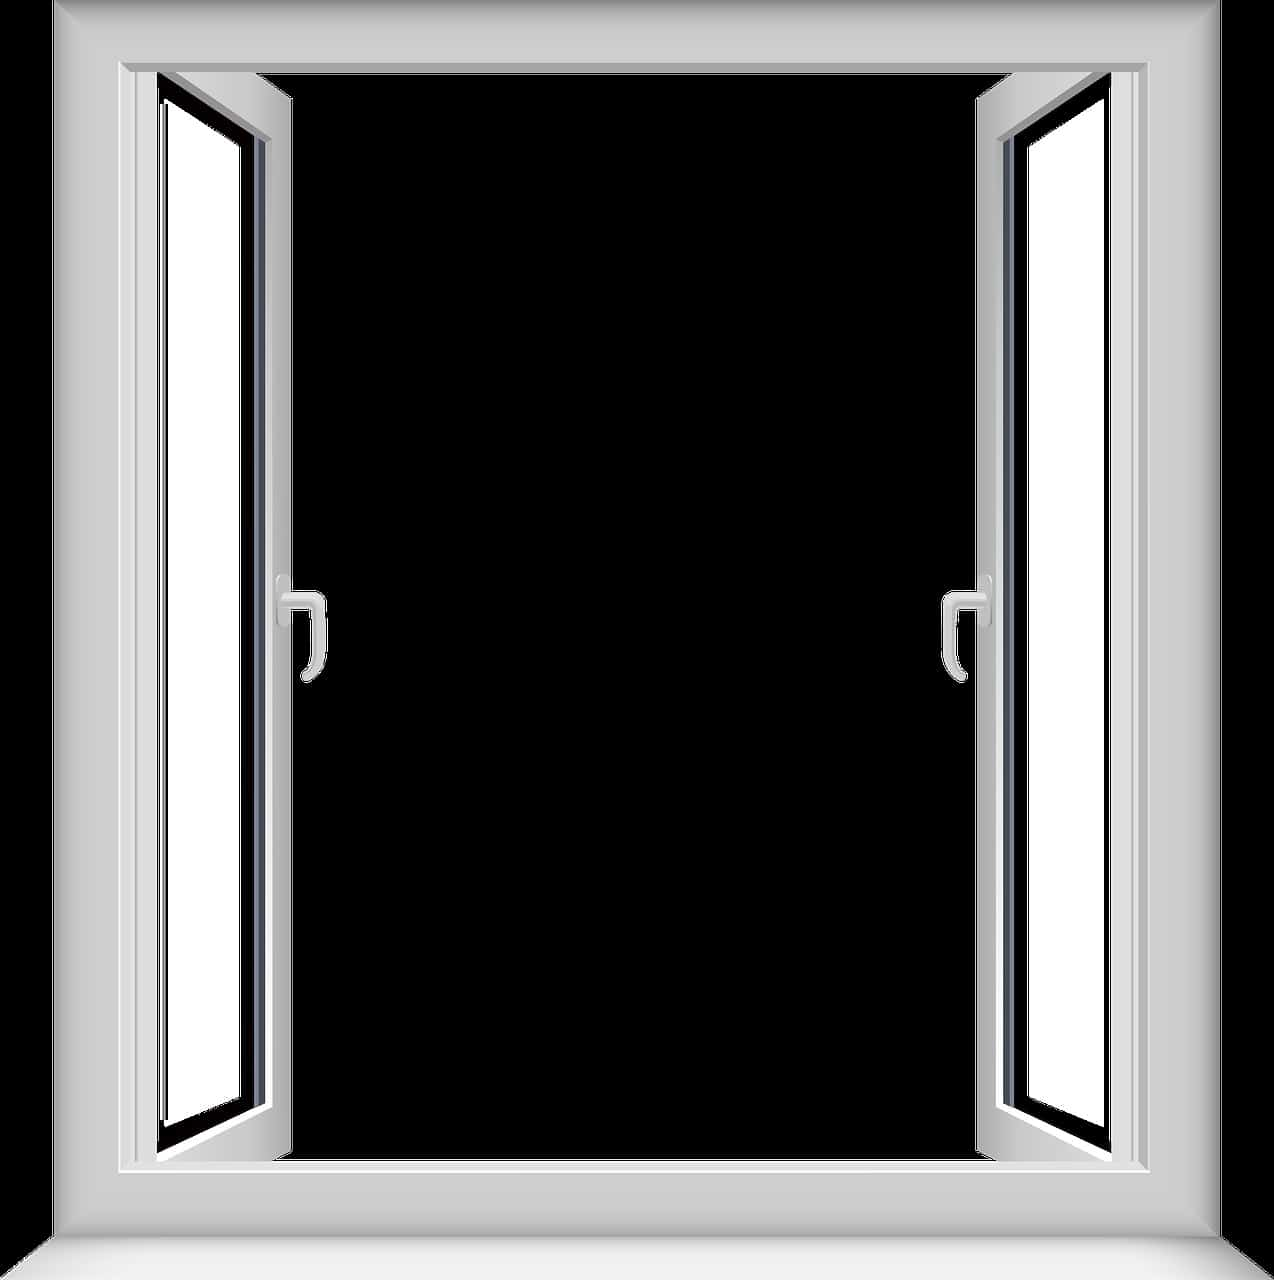 window transparent, open window, window